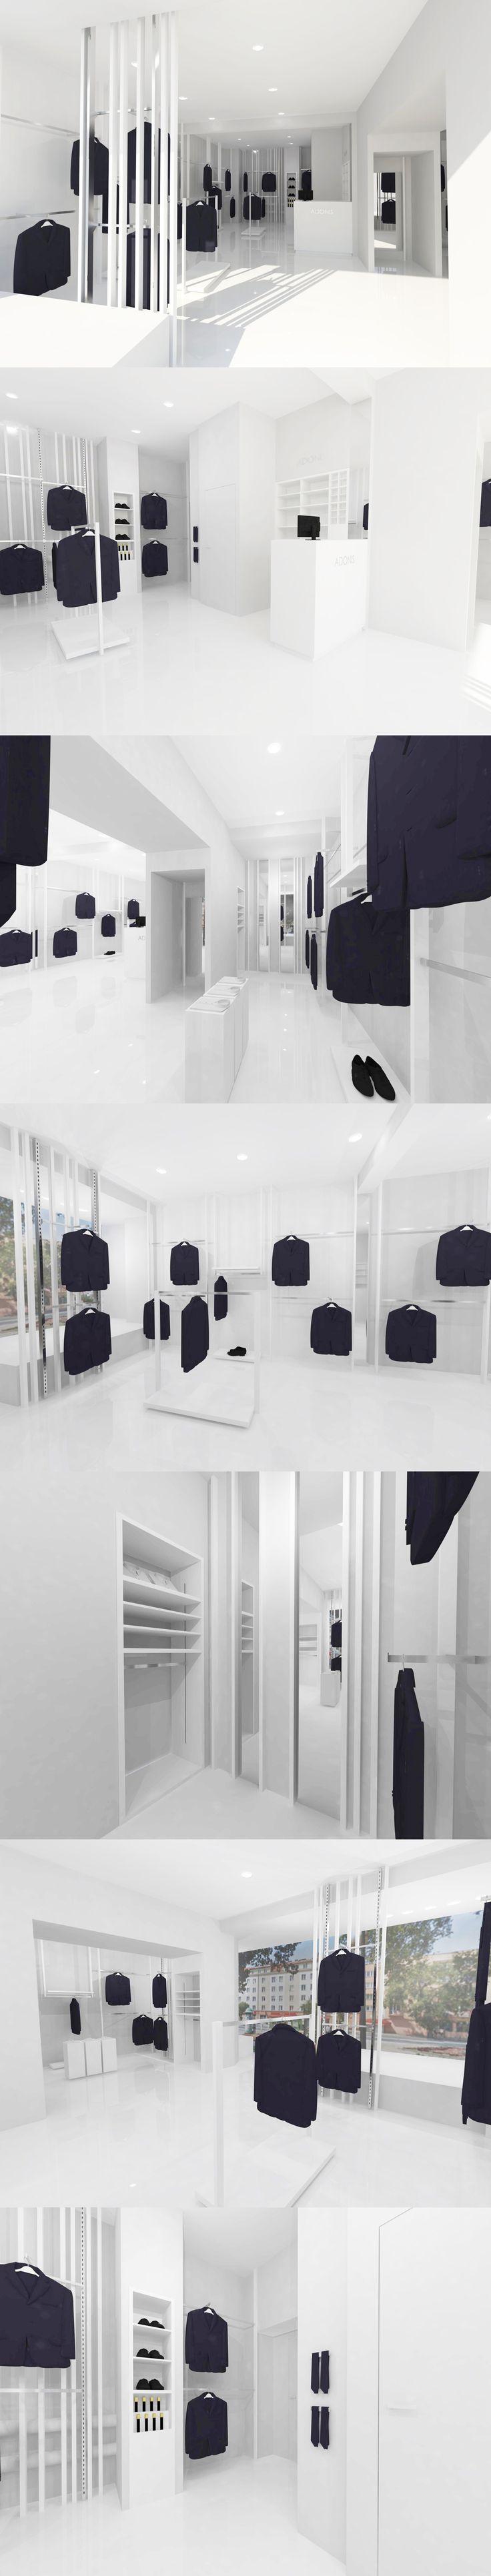 Conceptual design showroom for the manufacturer of suits Adonis.  Design by Debowskidesign.  www.debowskidesign.com